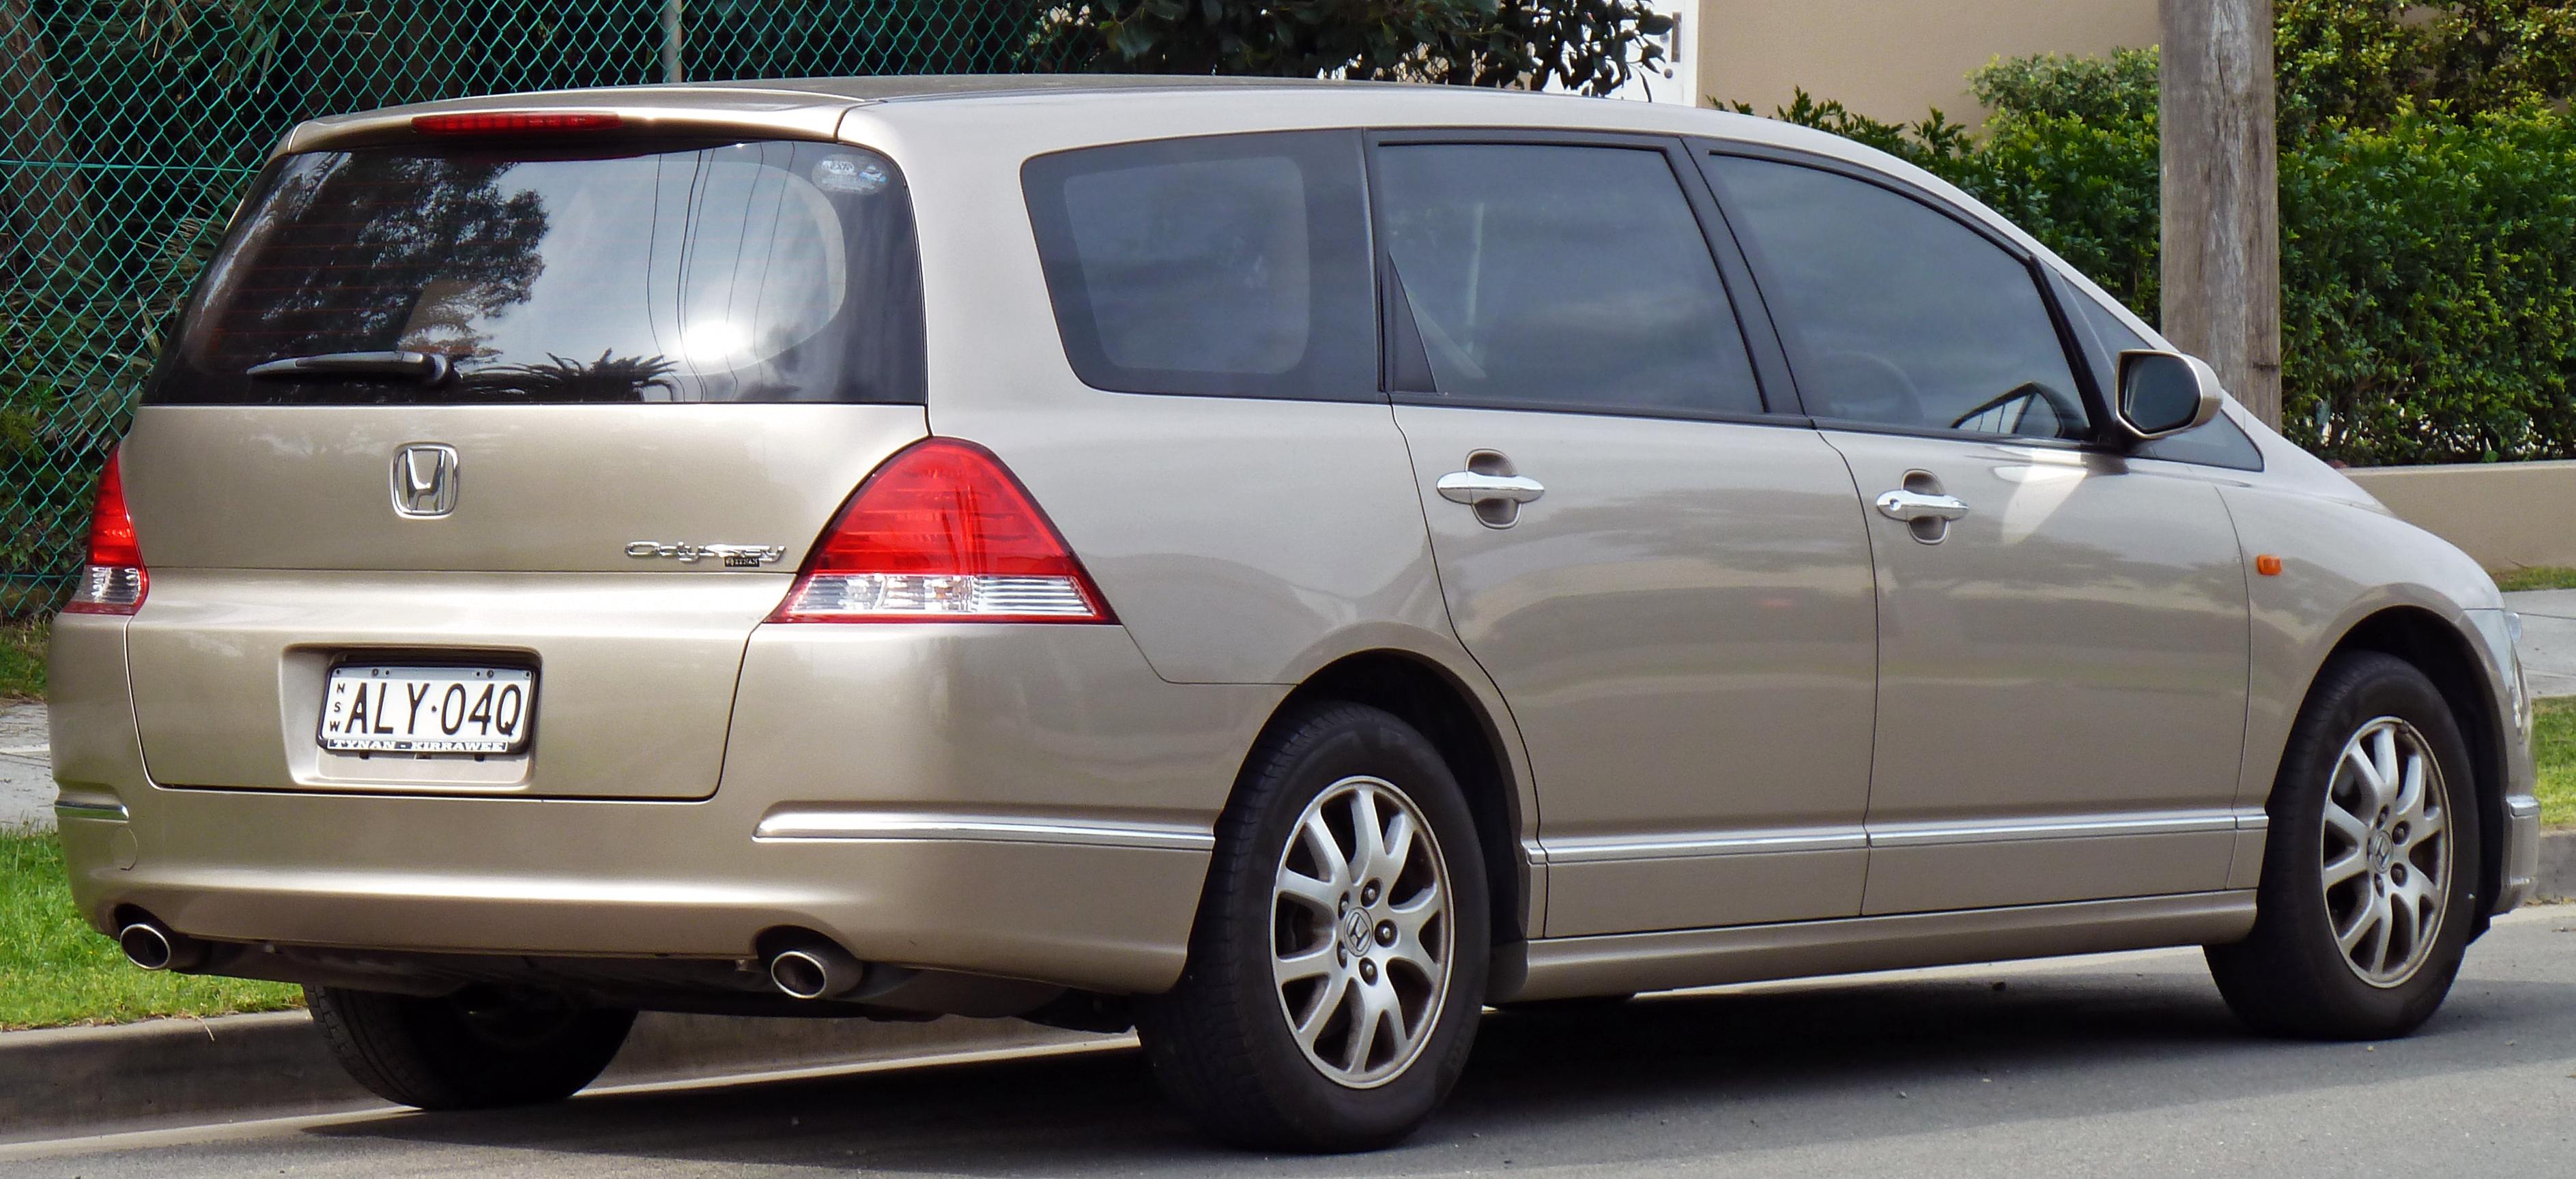 File:2004-2006 Honda Odyssey Luxury van 02.jpg - Wikimedia ...